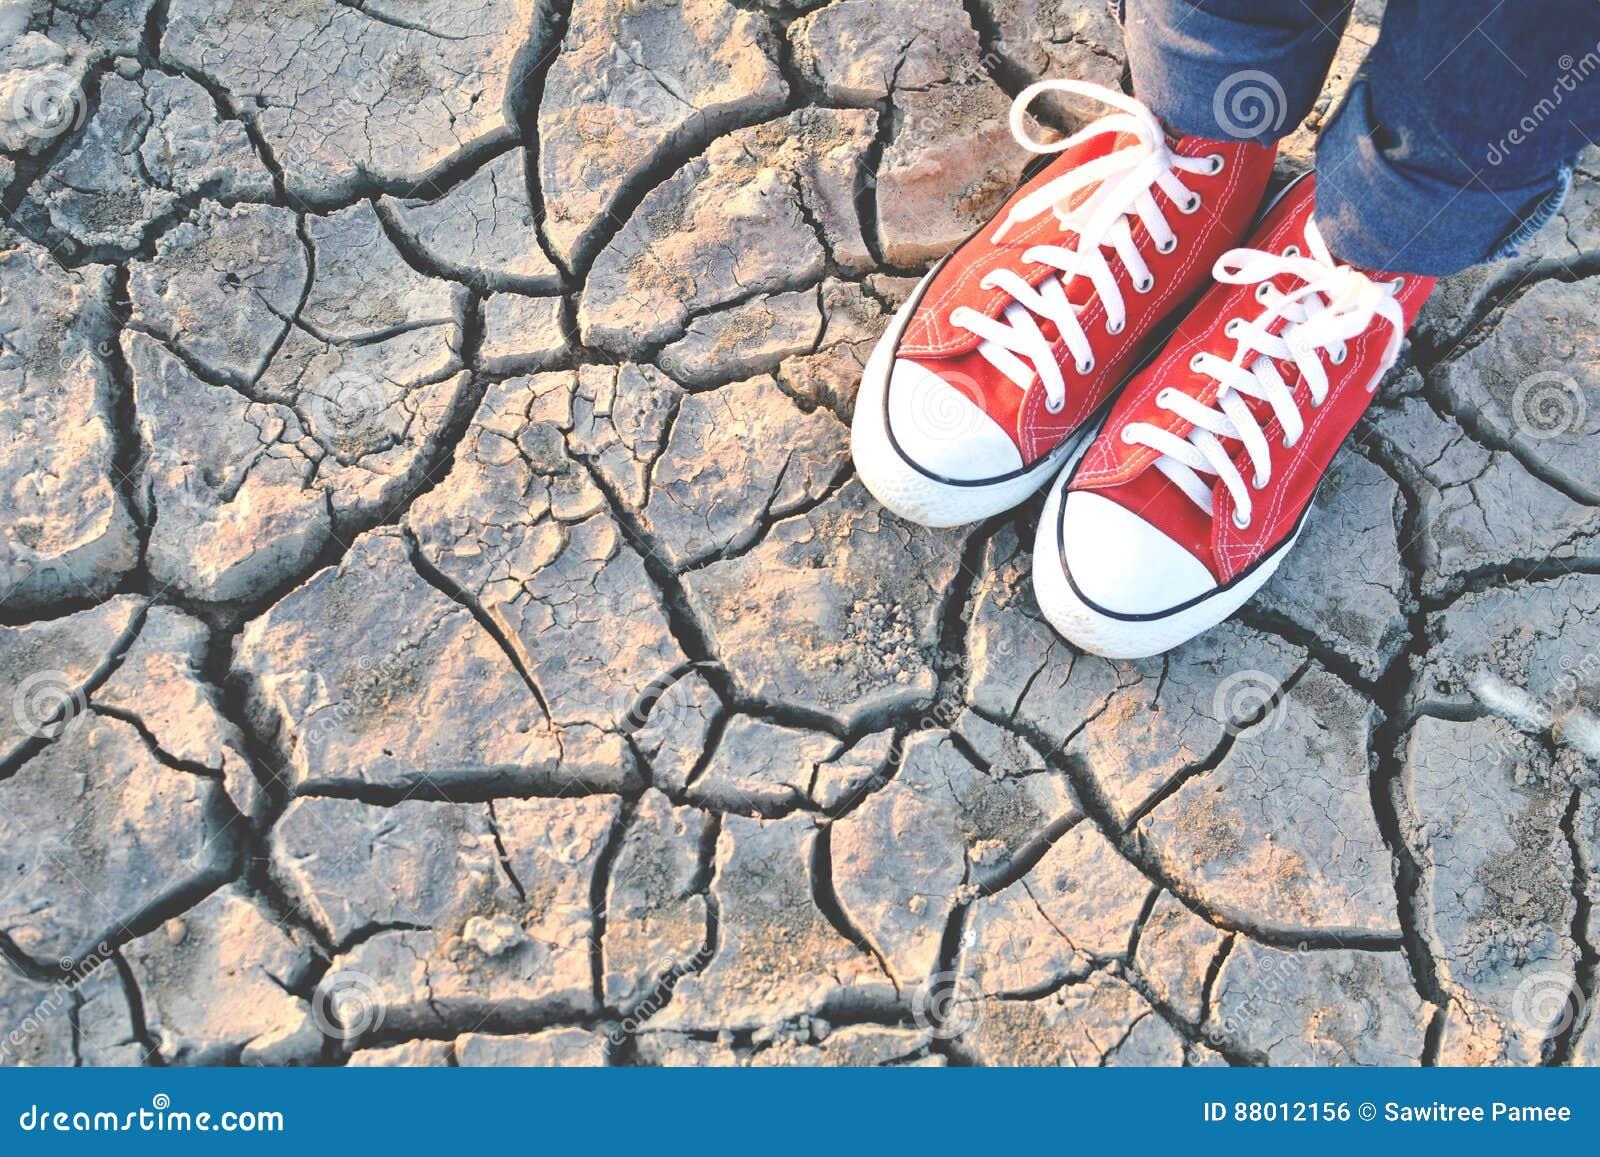 Tennisschoen op barst droge grond